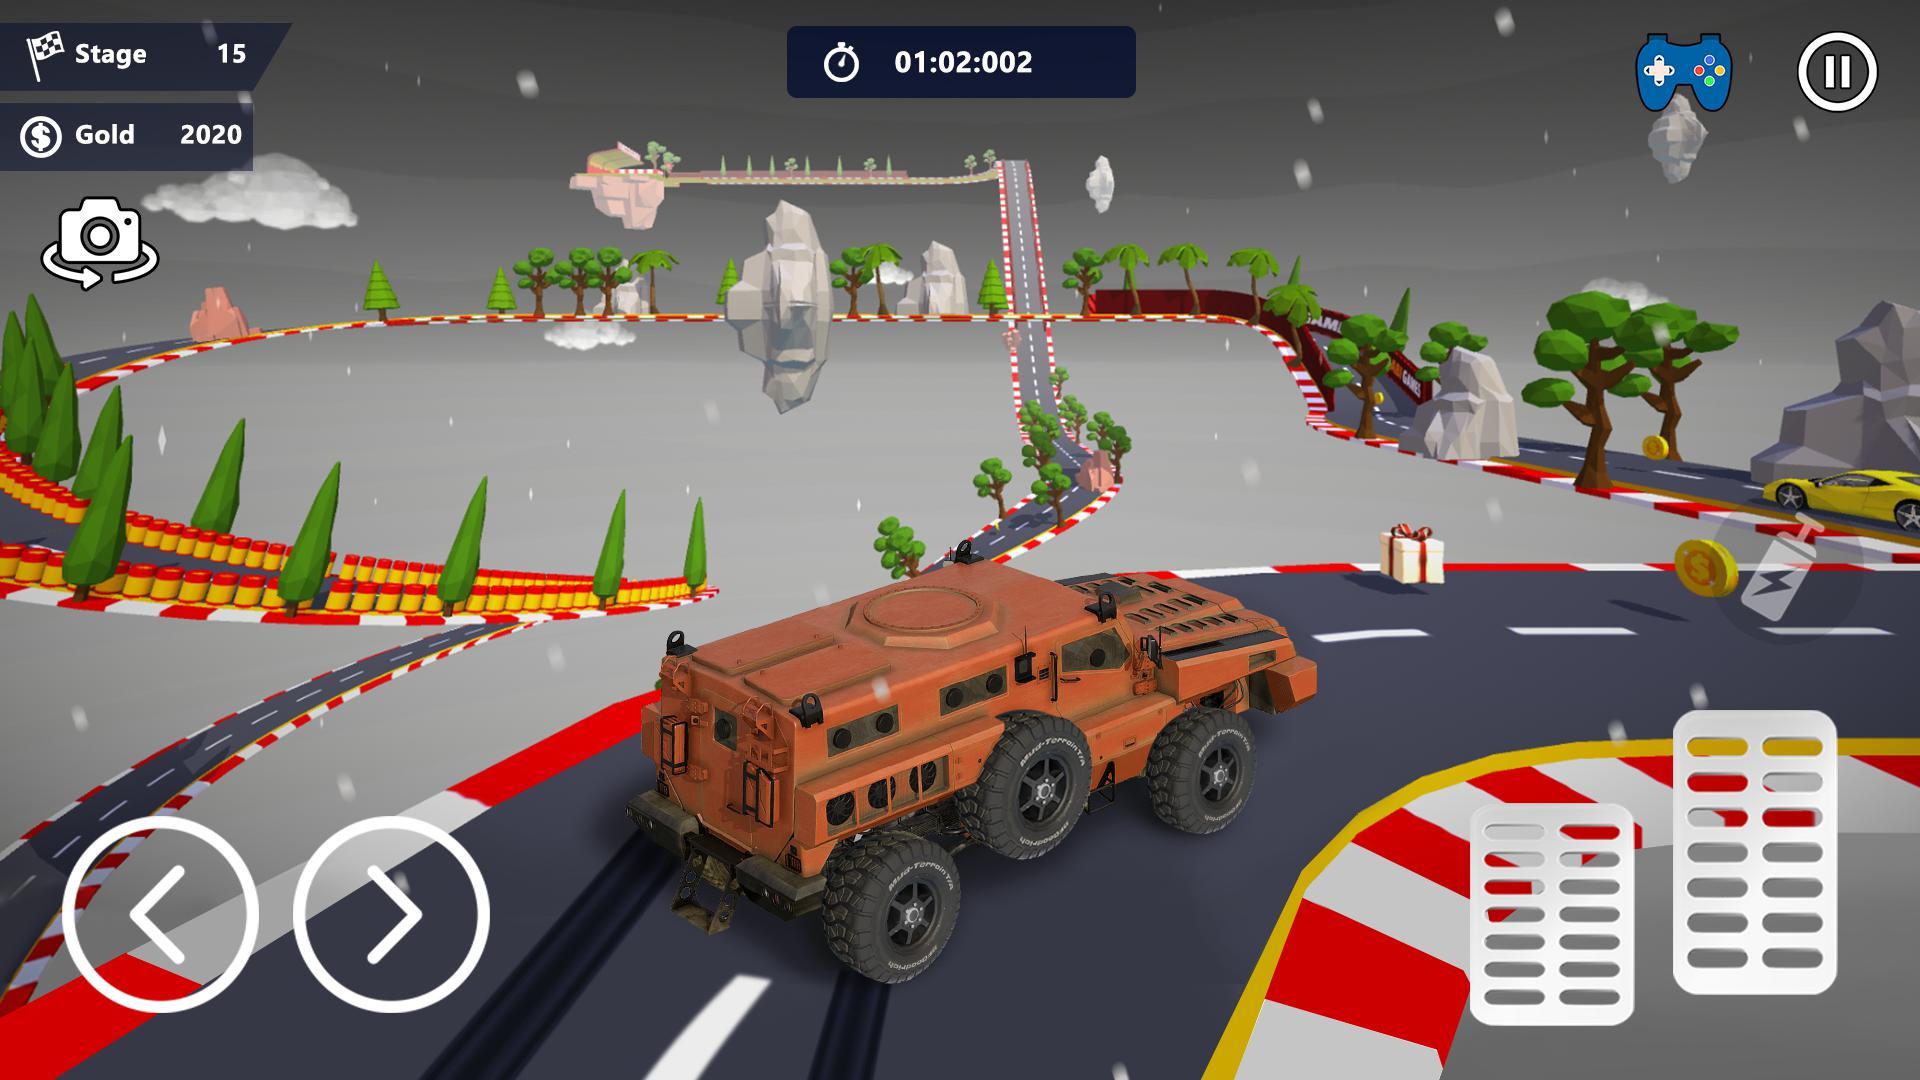 Car Stunts 3D Free - Extreme City GT Racing 游戏截图4